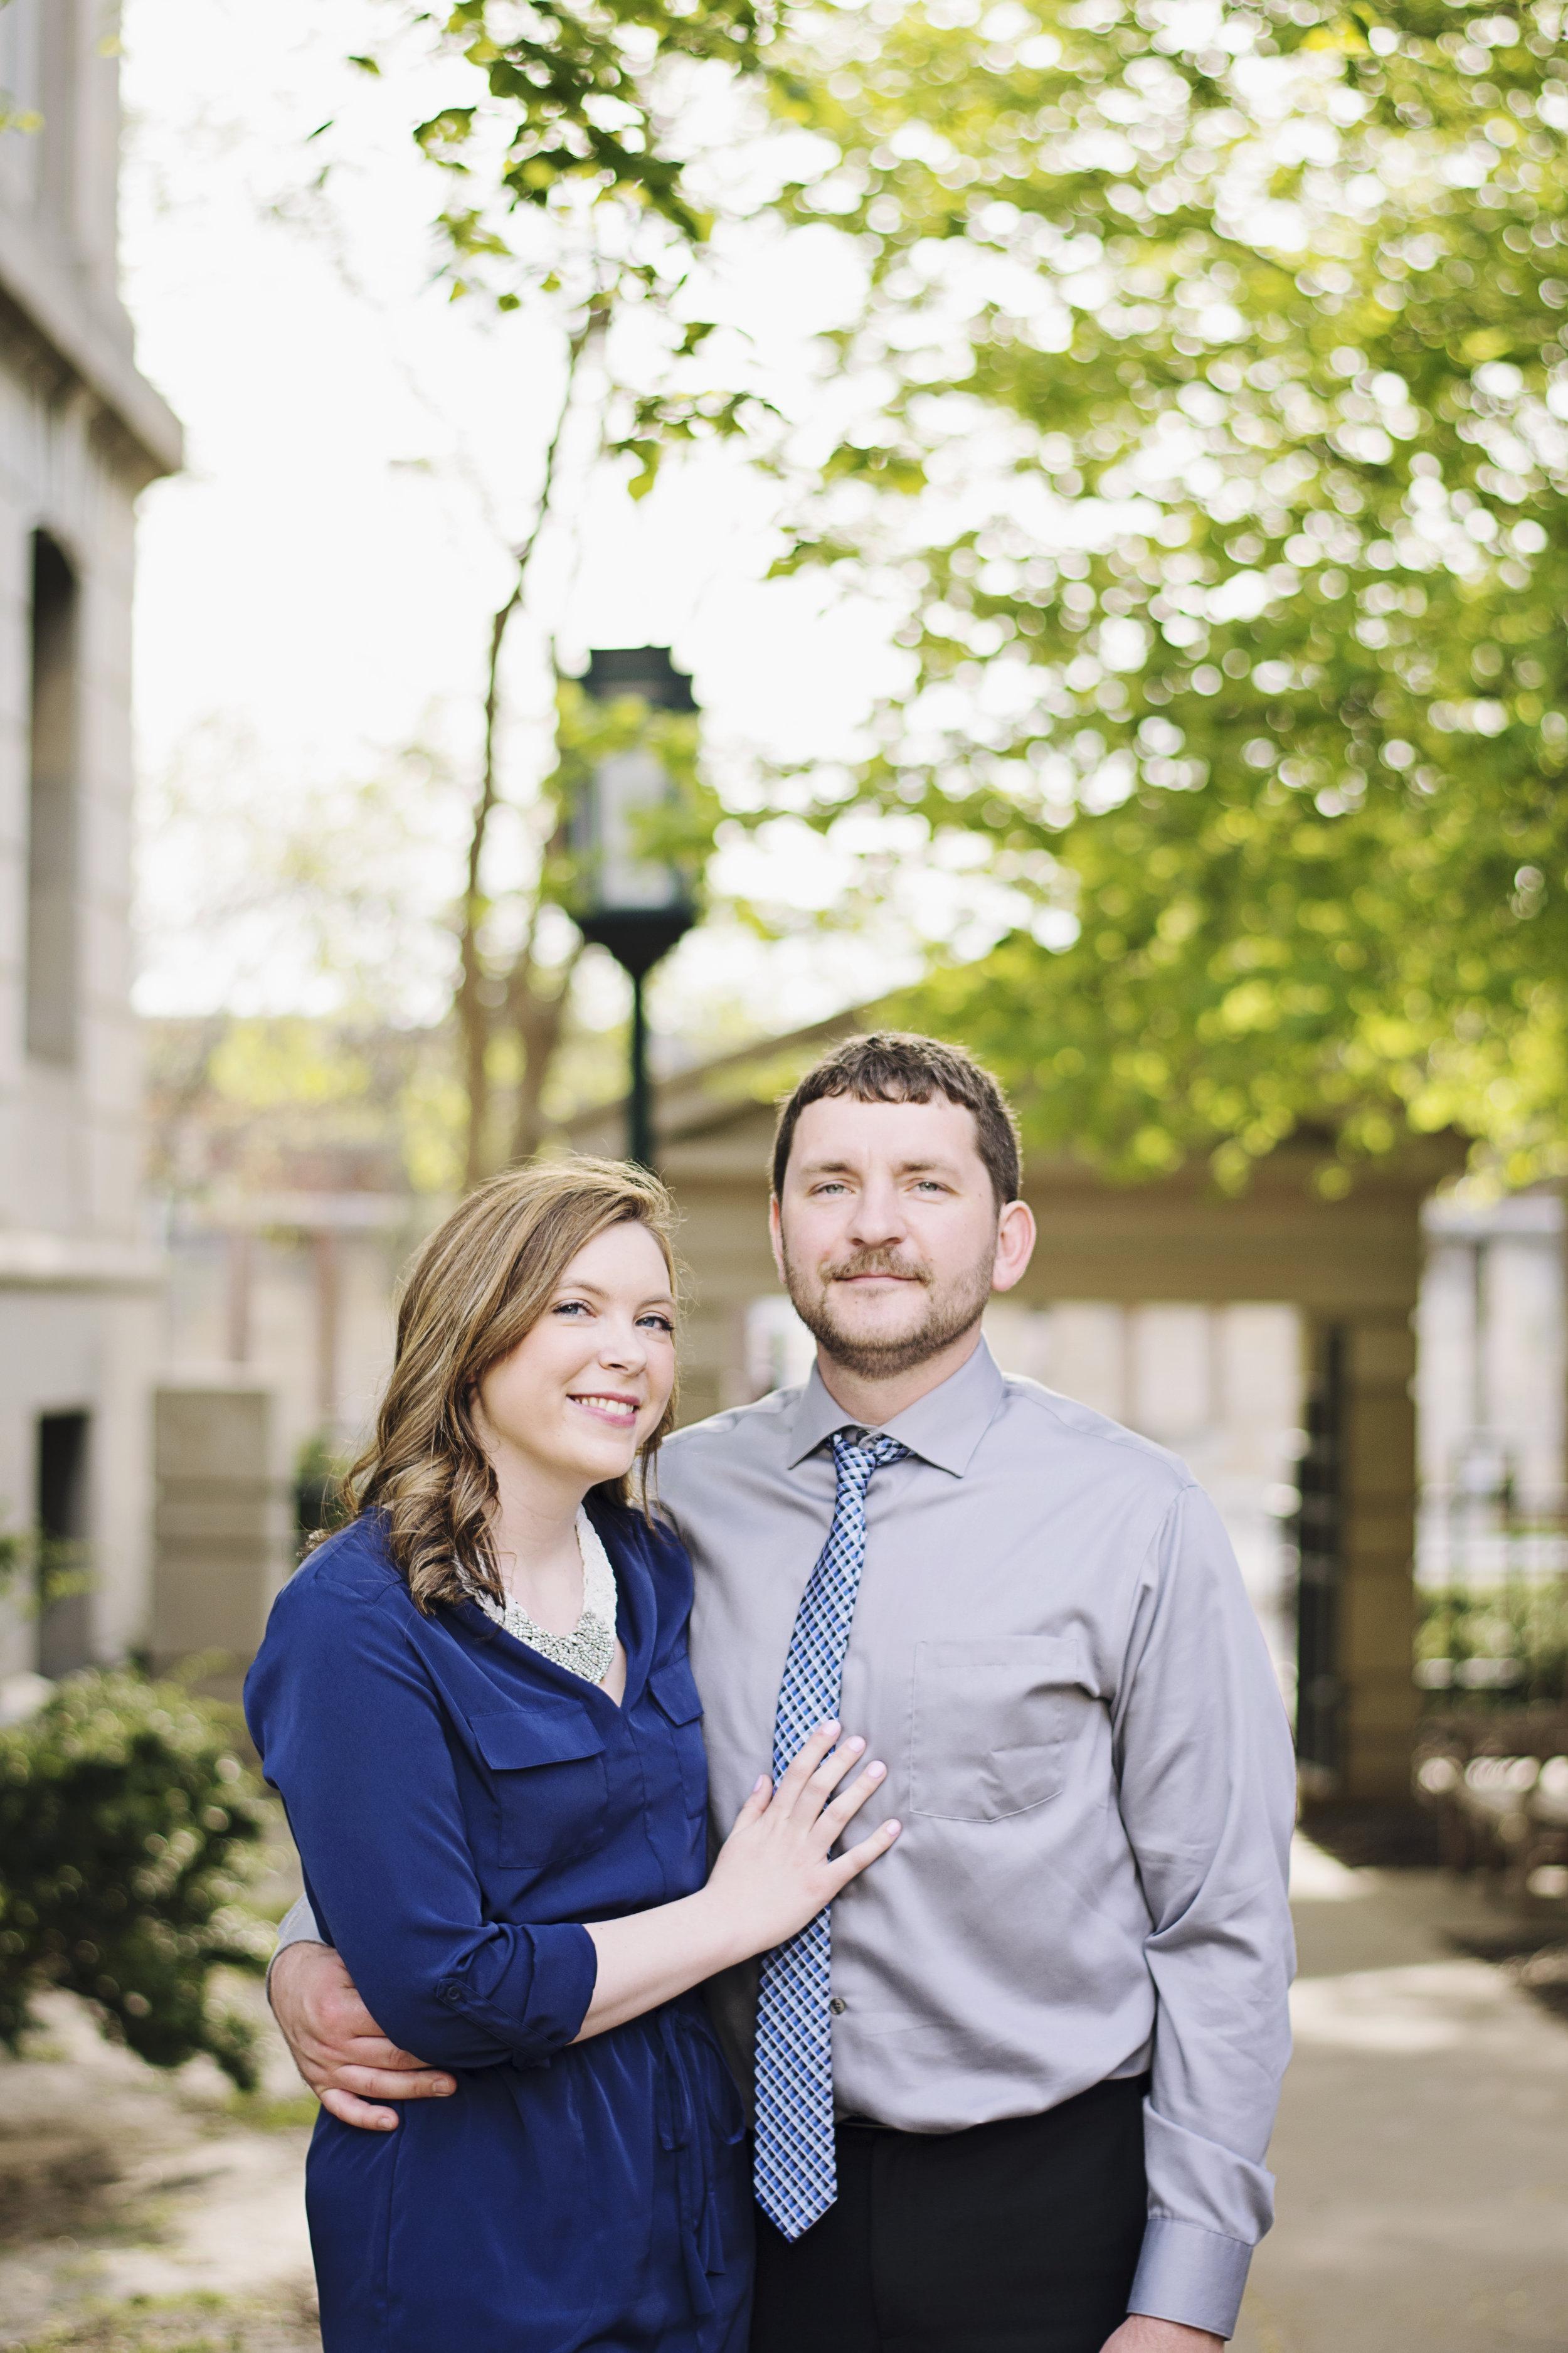 University of Iowa Campus Engagement | Iowa City Wedding Photographer